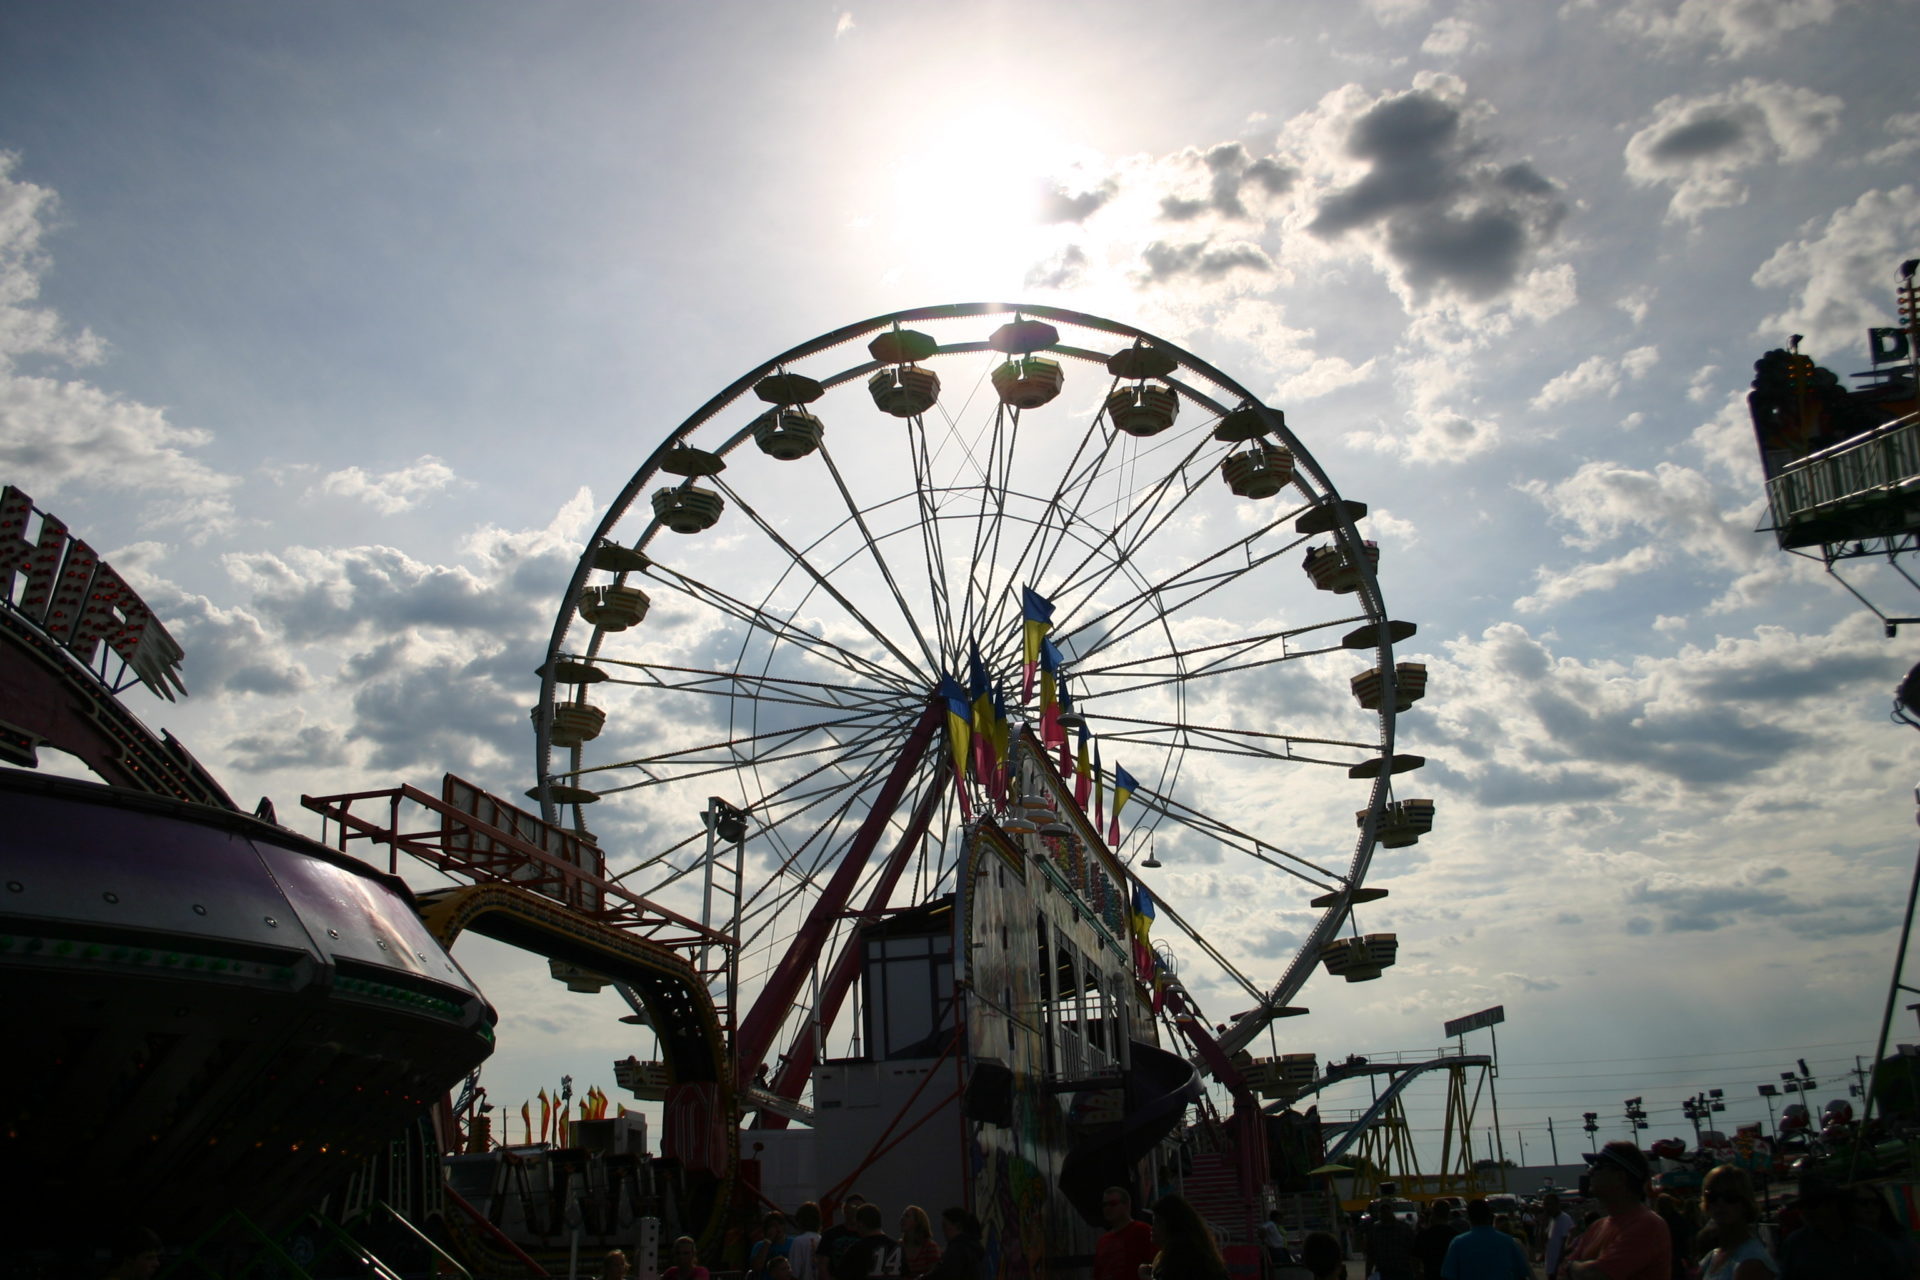 The Missouri State Fair in Sedalia, Missouri